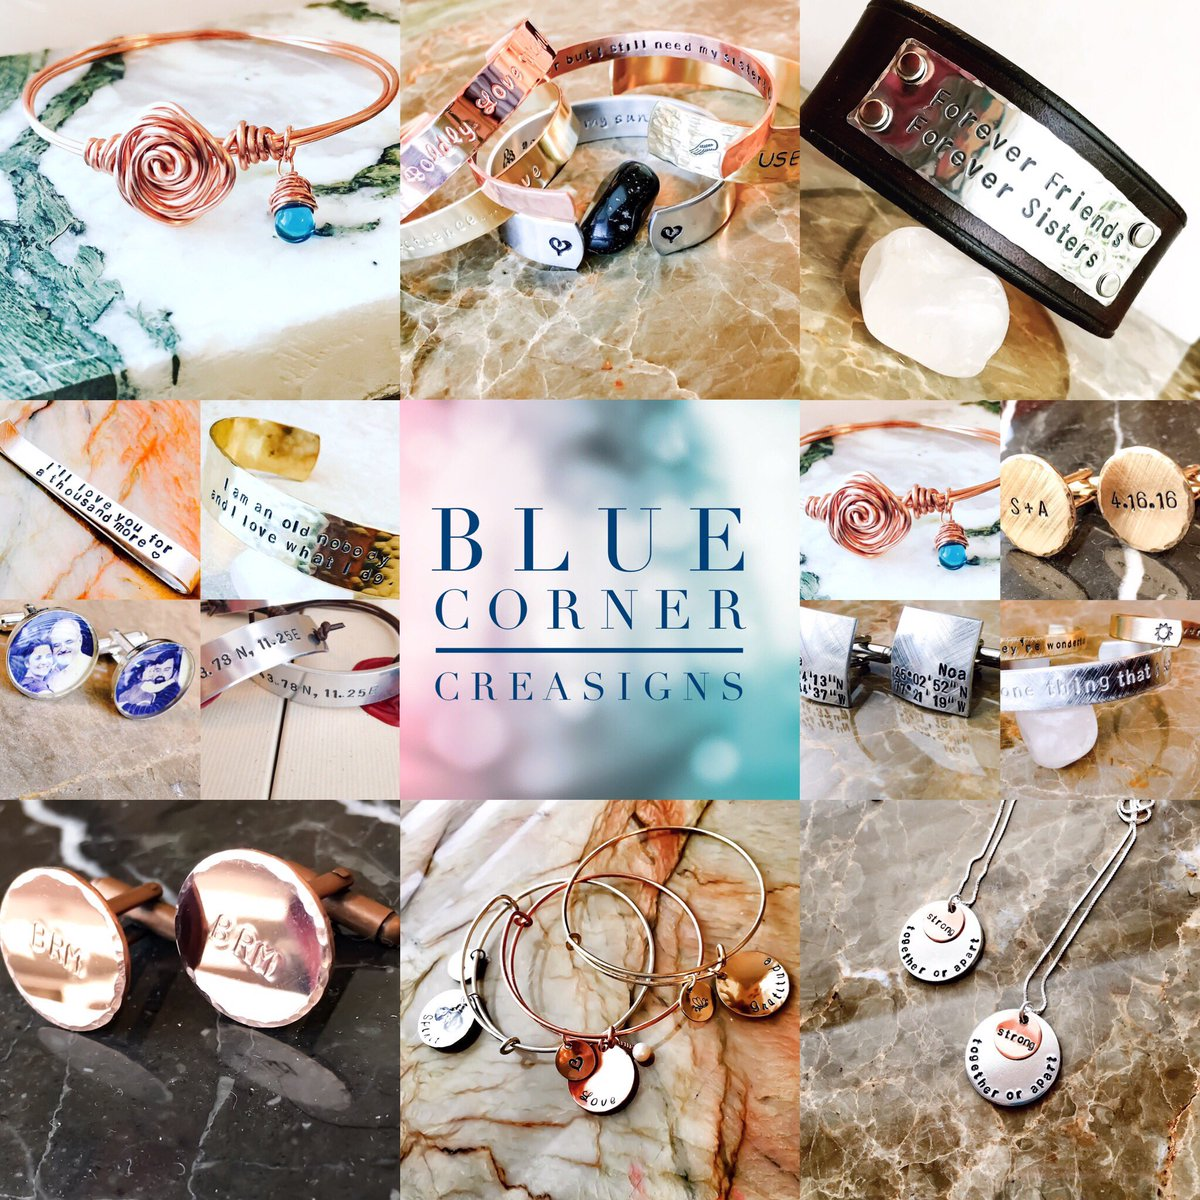 Personalize yours    http:// Etsy.me/1tRDvwt  &nbsp;    #etsyRT #etsymntt #etsy #ebay #art #etsyretwt #epiconetsy #etsyaaa #bride #groom #wedding #bridesmaids #fashion #weddingparty #personalizedjewelry #jetteam #engaged #ThursdayThoughts  #ThursdayMotivation #Adulthoodin4Words #emmys<br>http://pic.twitter.com/K91amY8P8Z